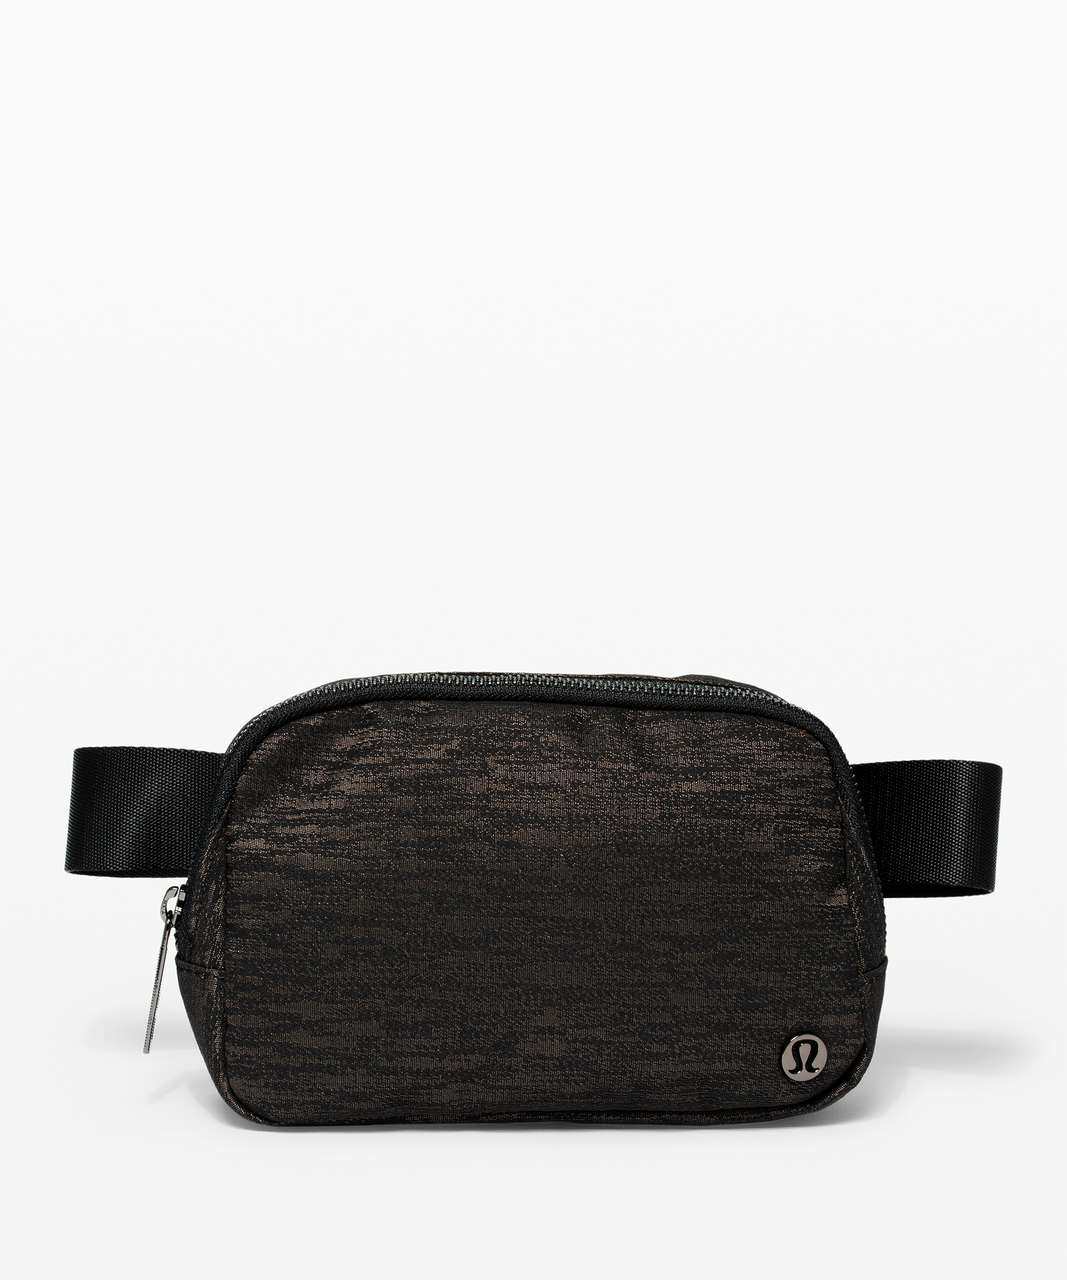 Lululemon Everywhere Belt Bag *1L - Aqueous Ikat Jacquard Black Highlander